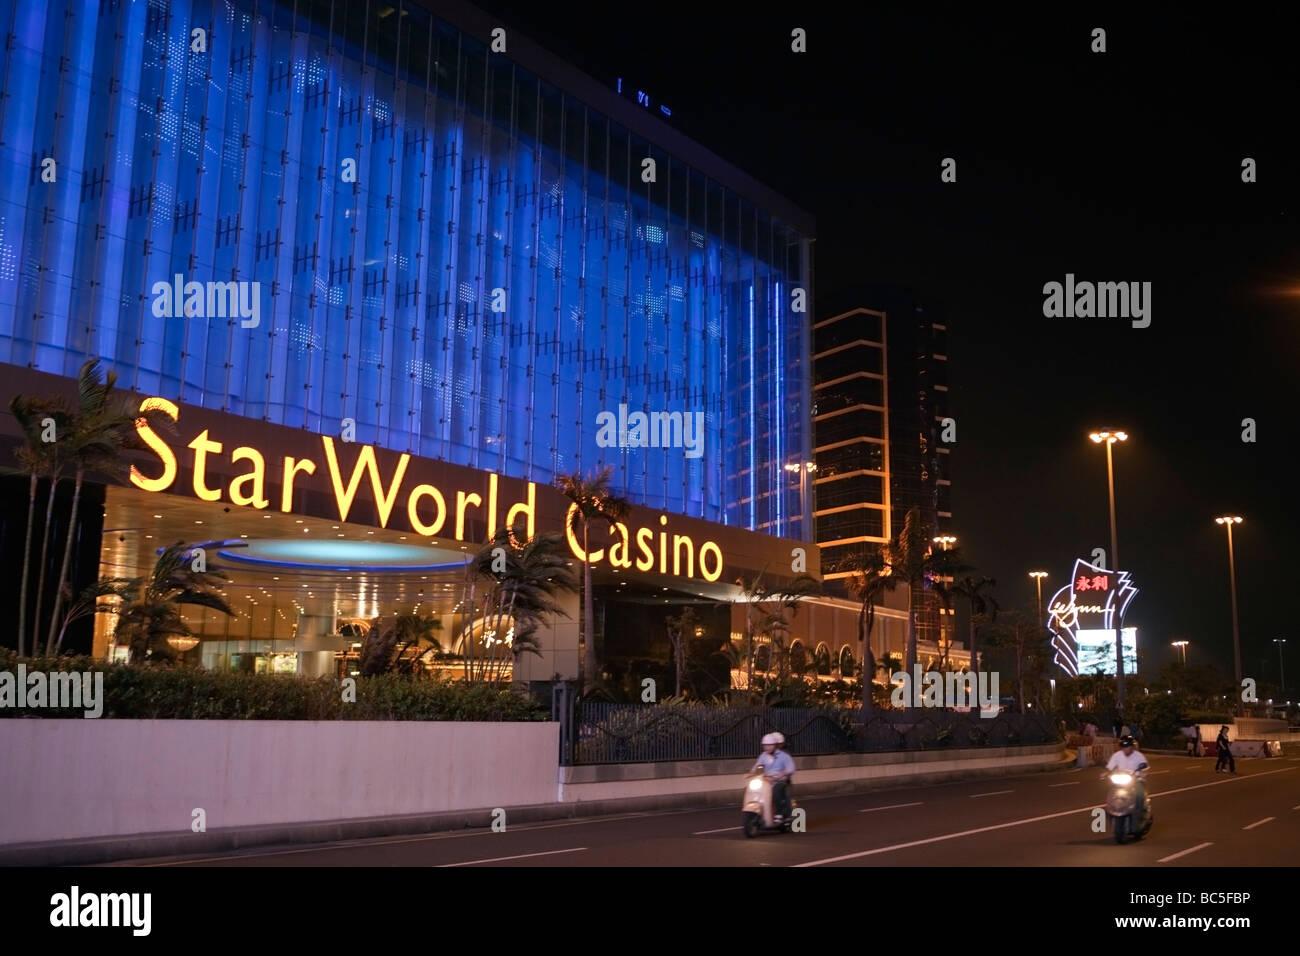 bestbet online casino and sport book